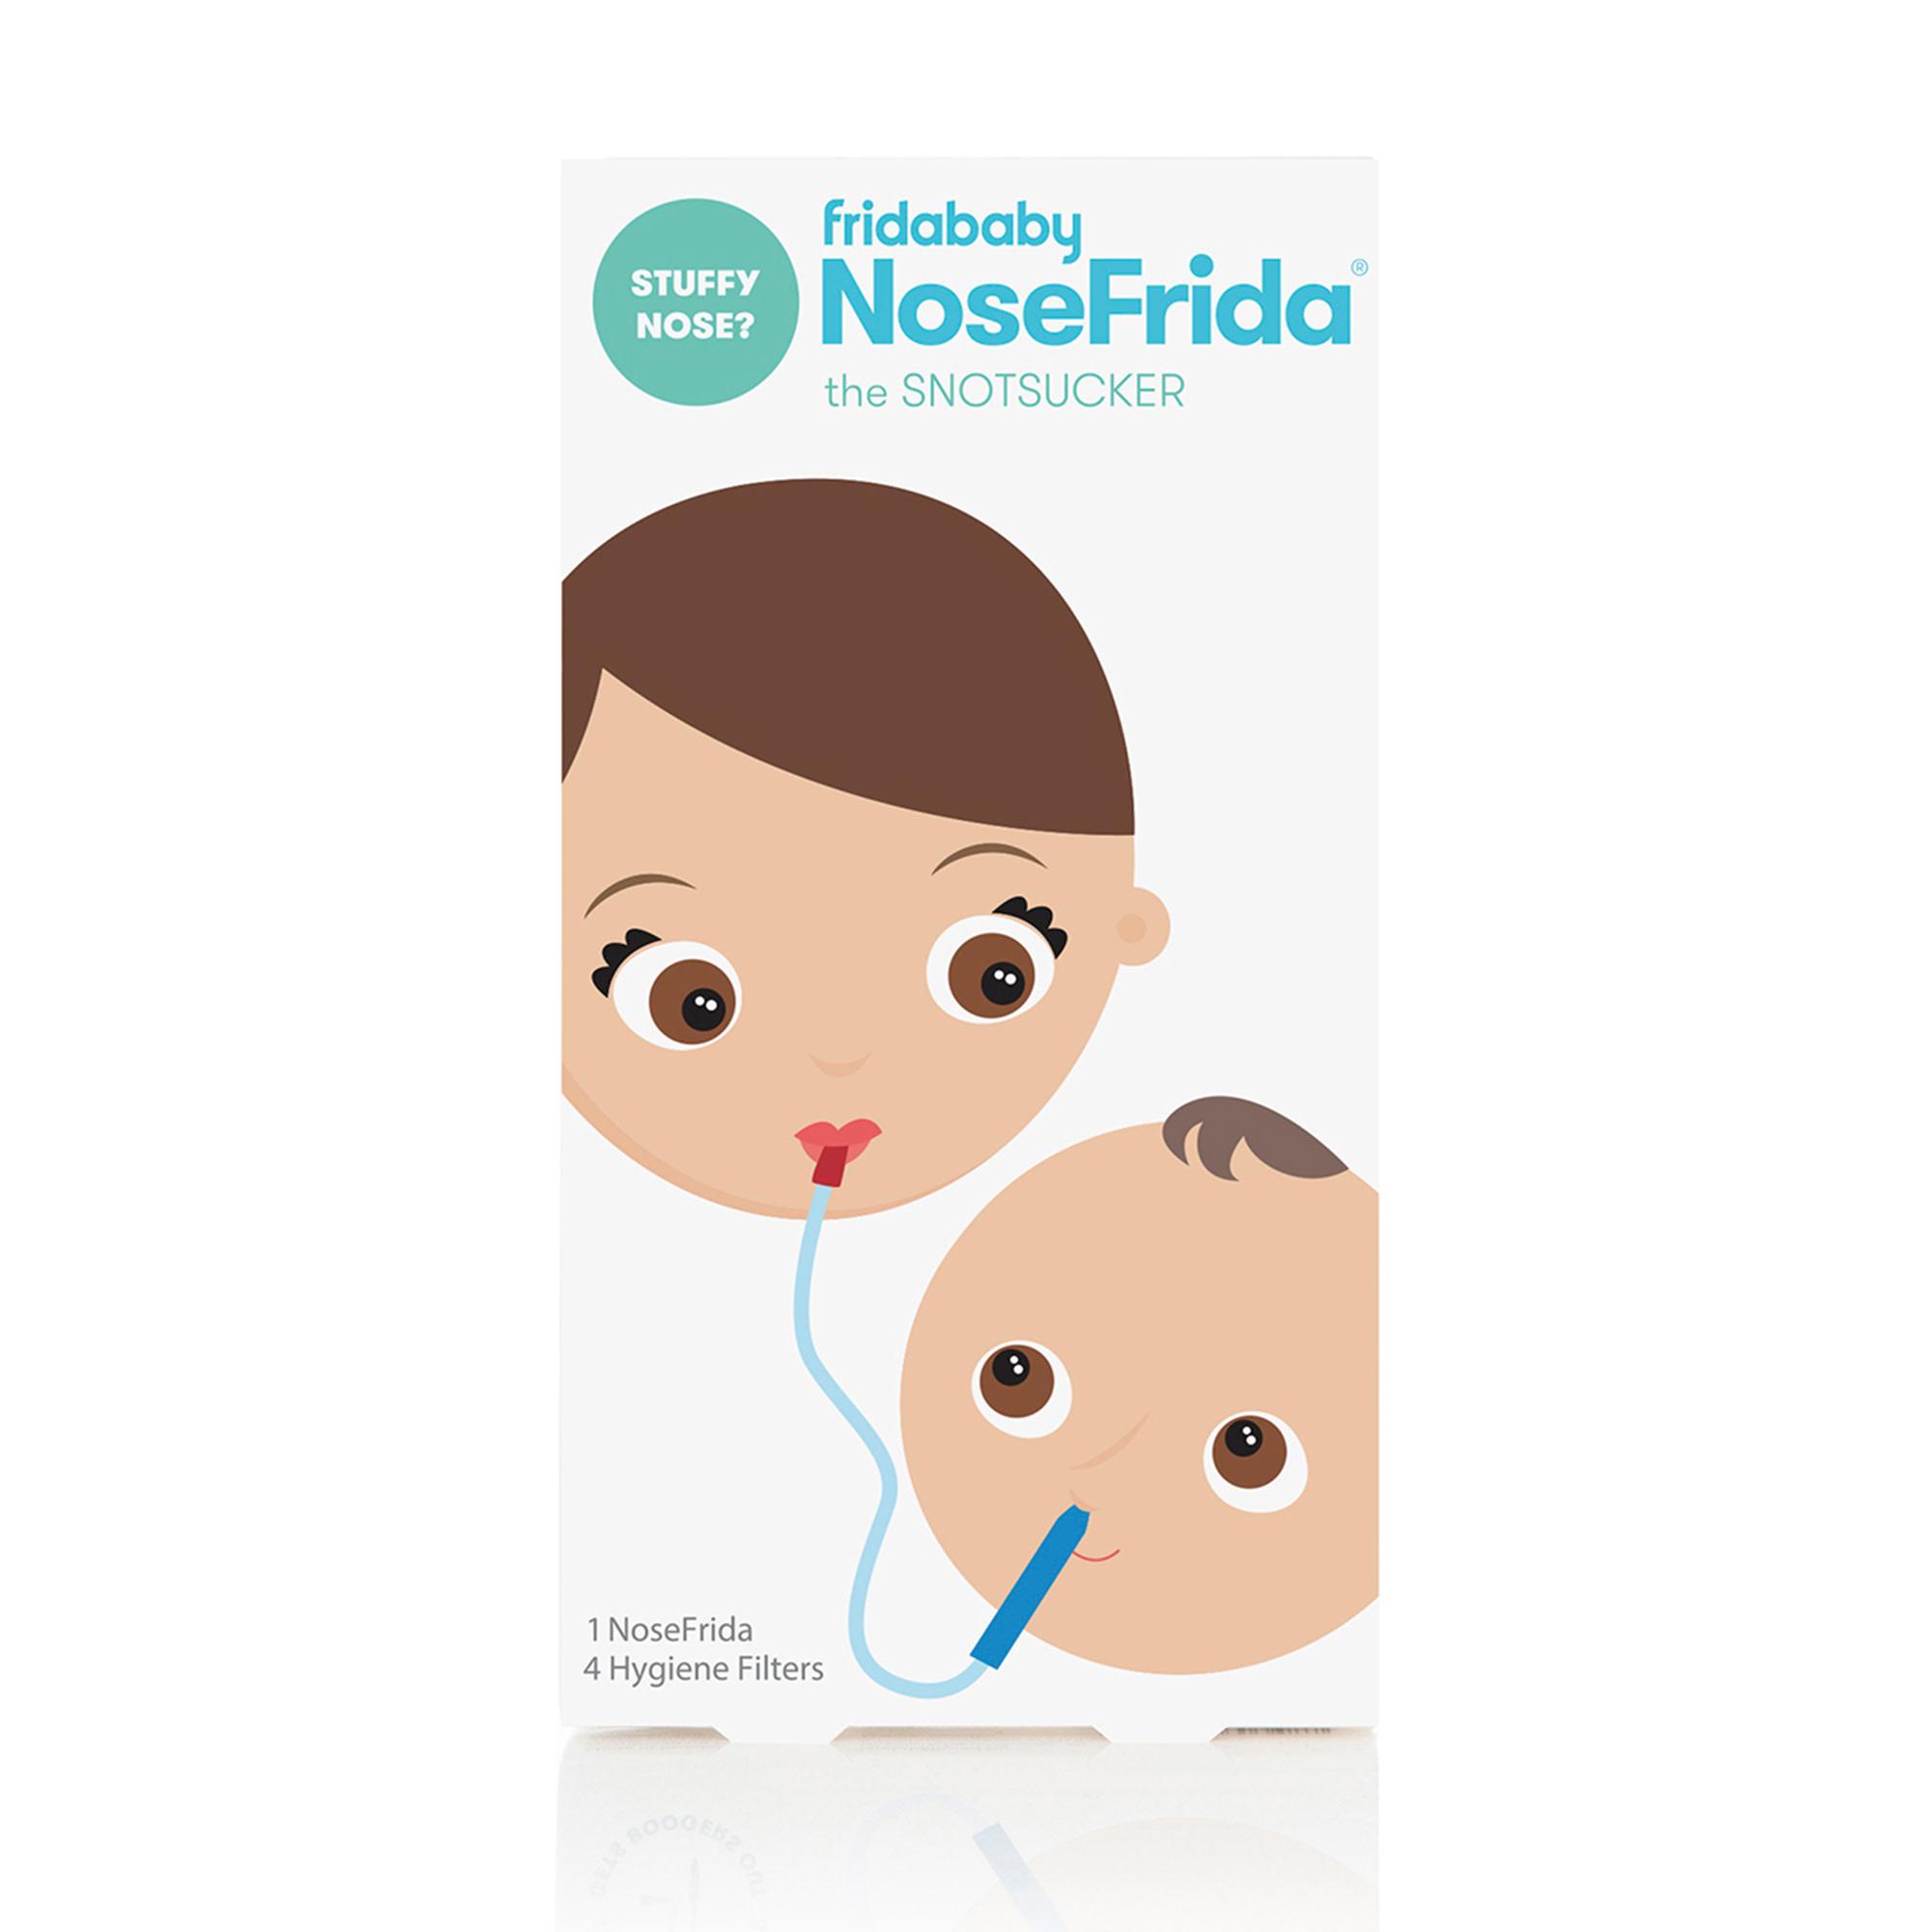 Fridababy NoseFrida Aspirator